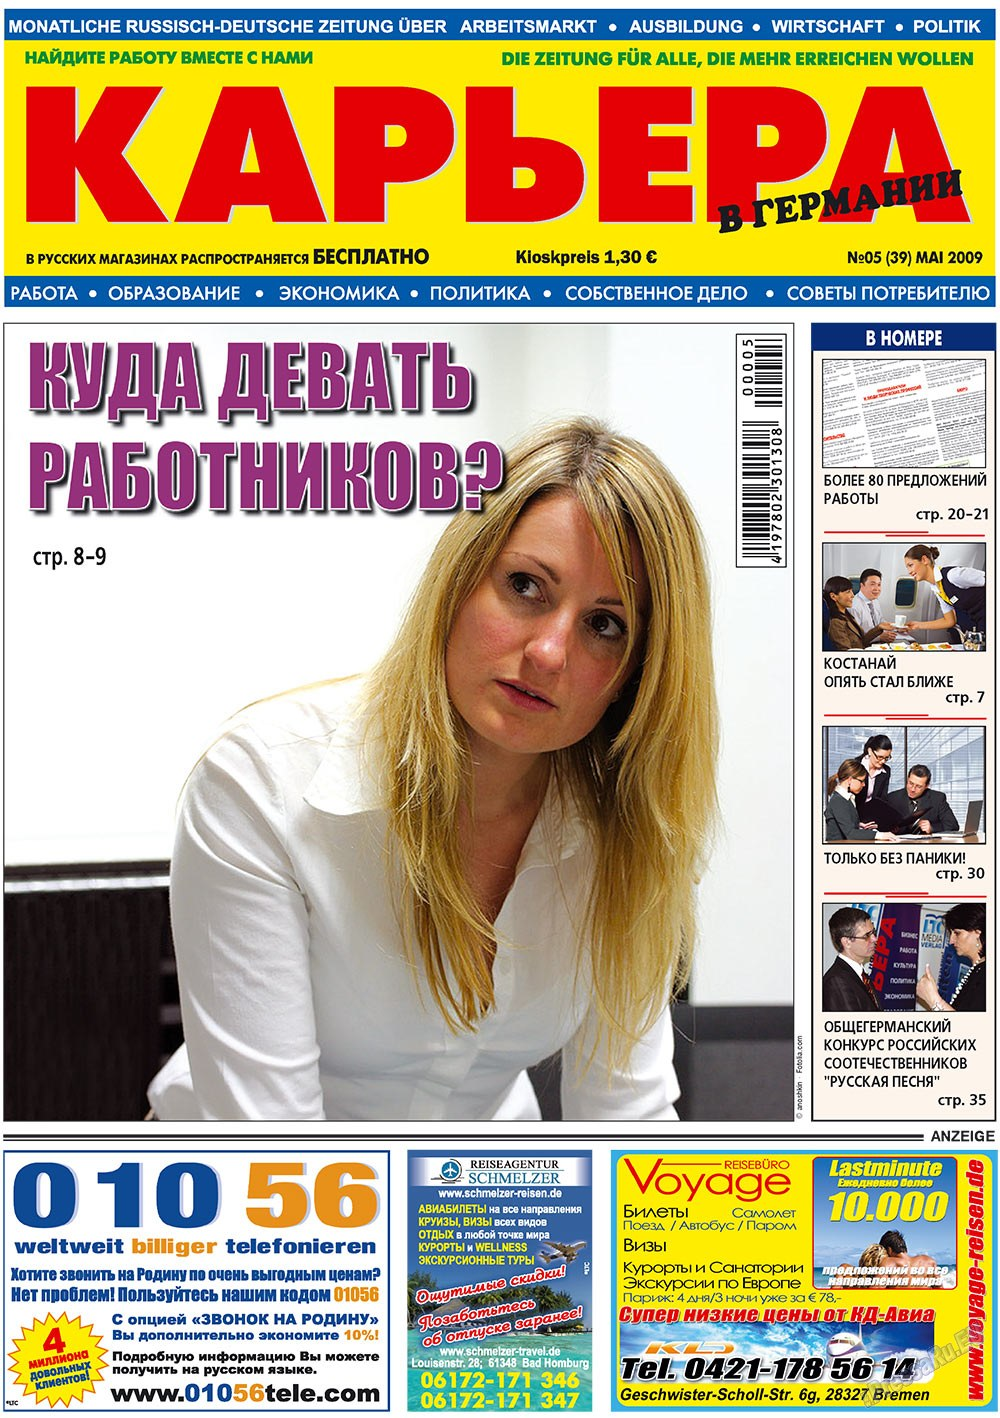 Карьера (газета). 2009 год, номер 5, стр. 1